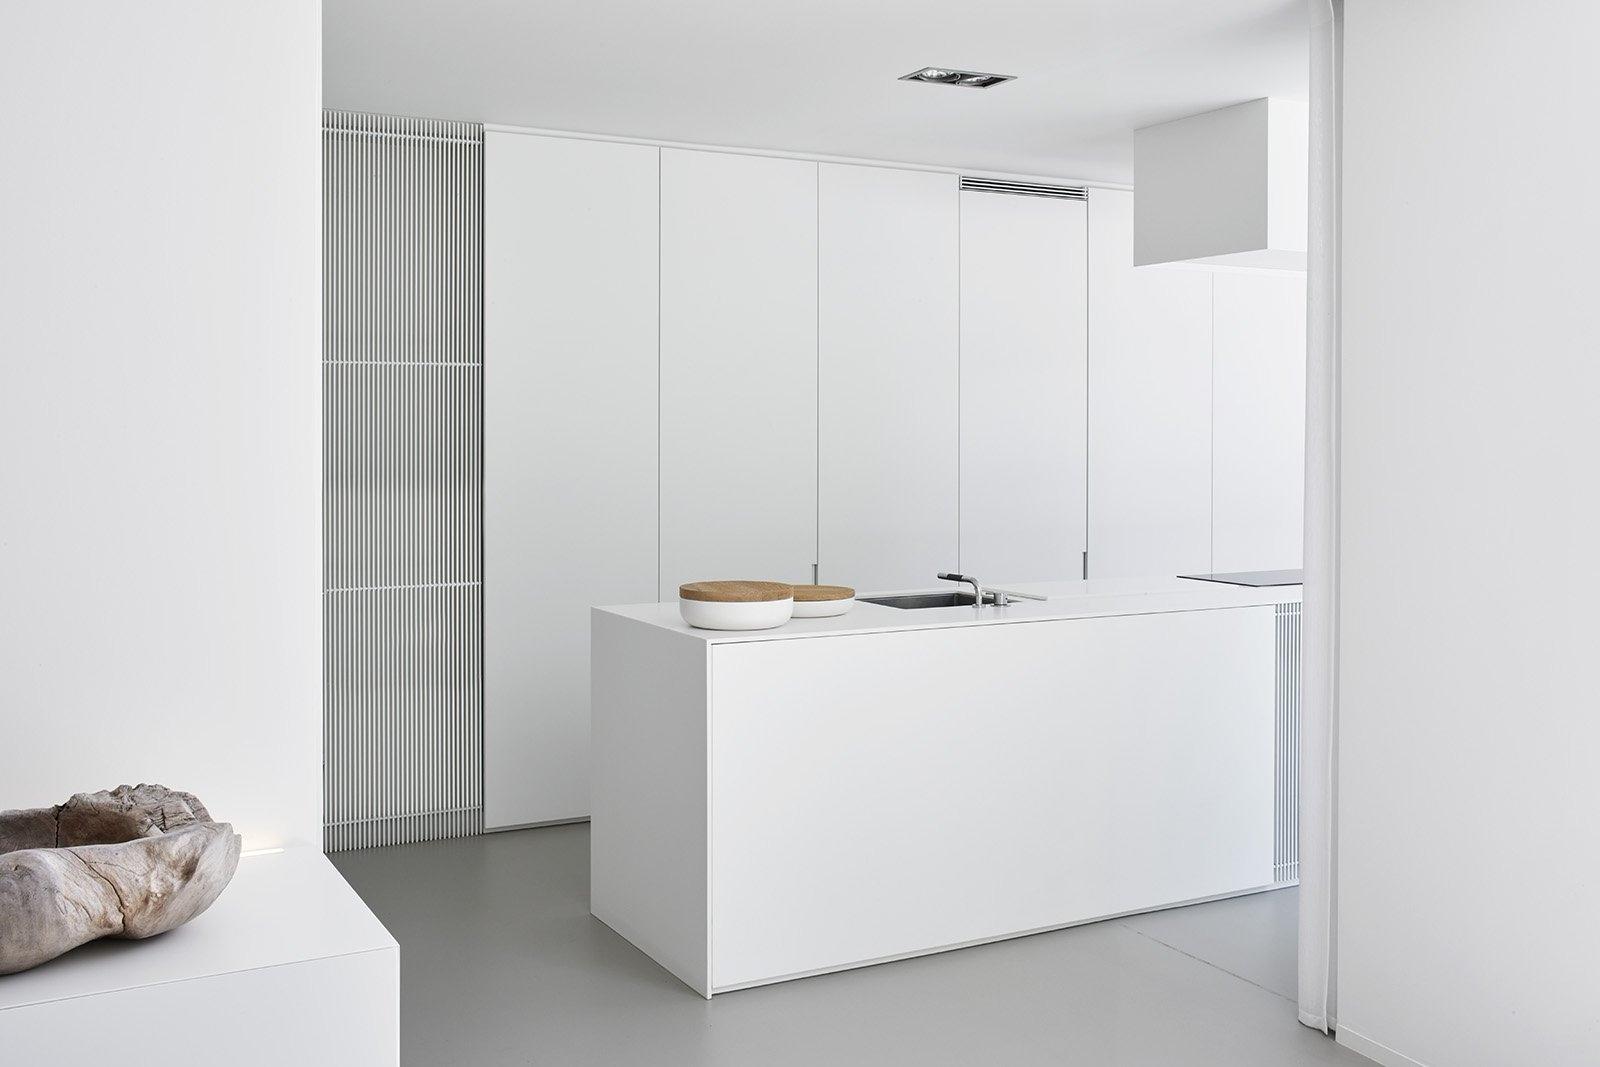 Keerbergen House ticks boxes. m - minimalissimo | ello